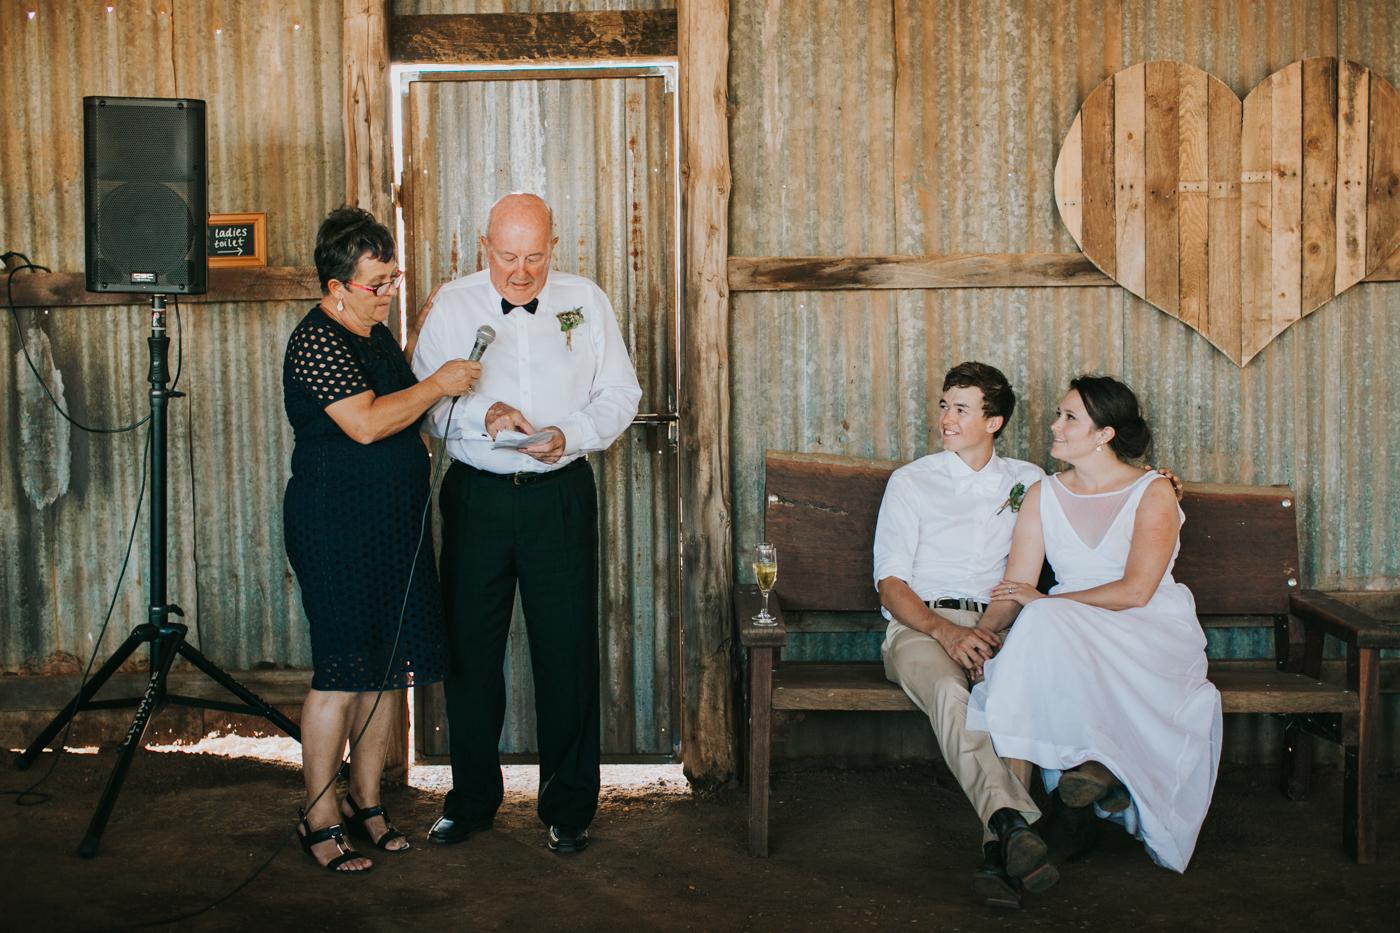 Nicolle & Jacob - Dubbo Wedding - Country Australia - Samantha Heather Photography-225.jpg